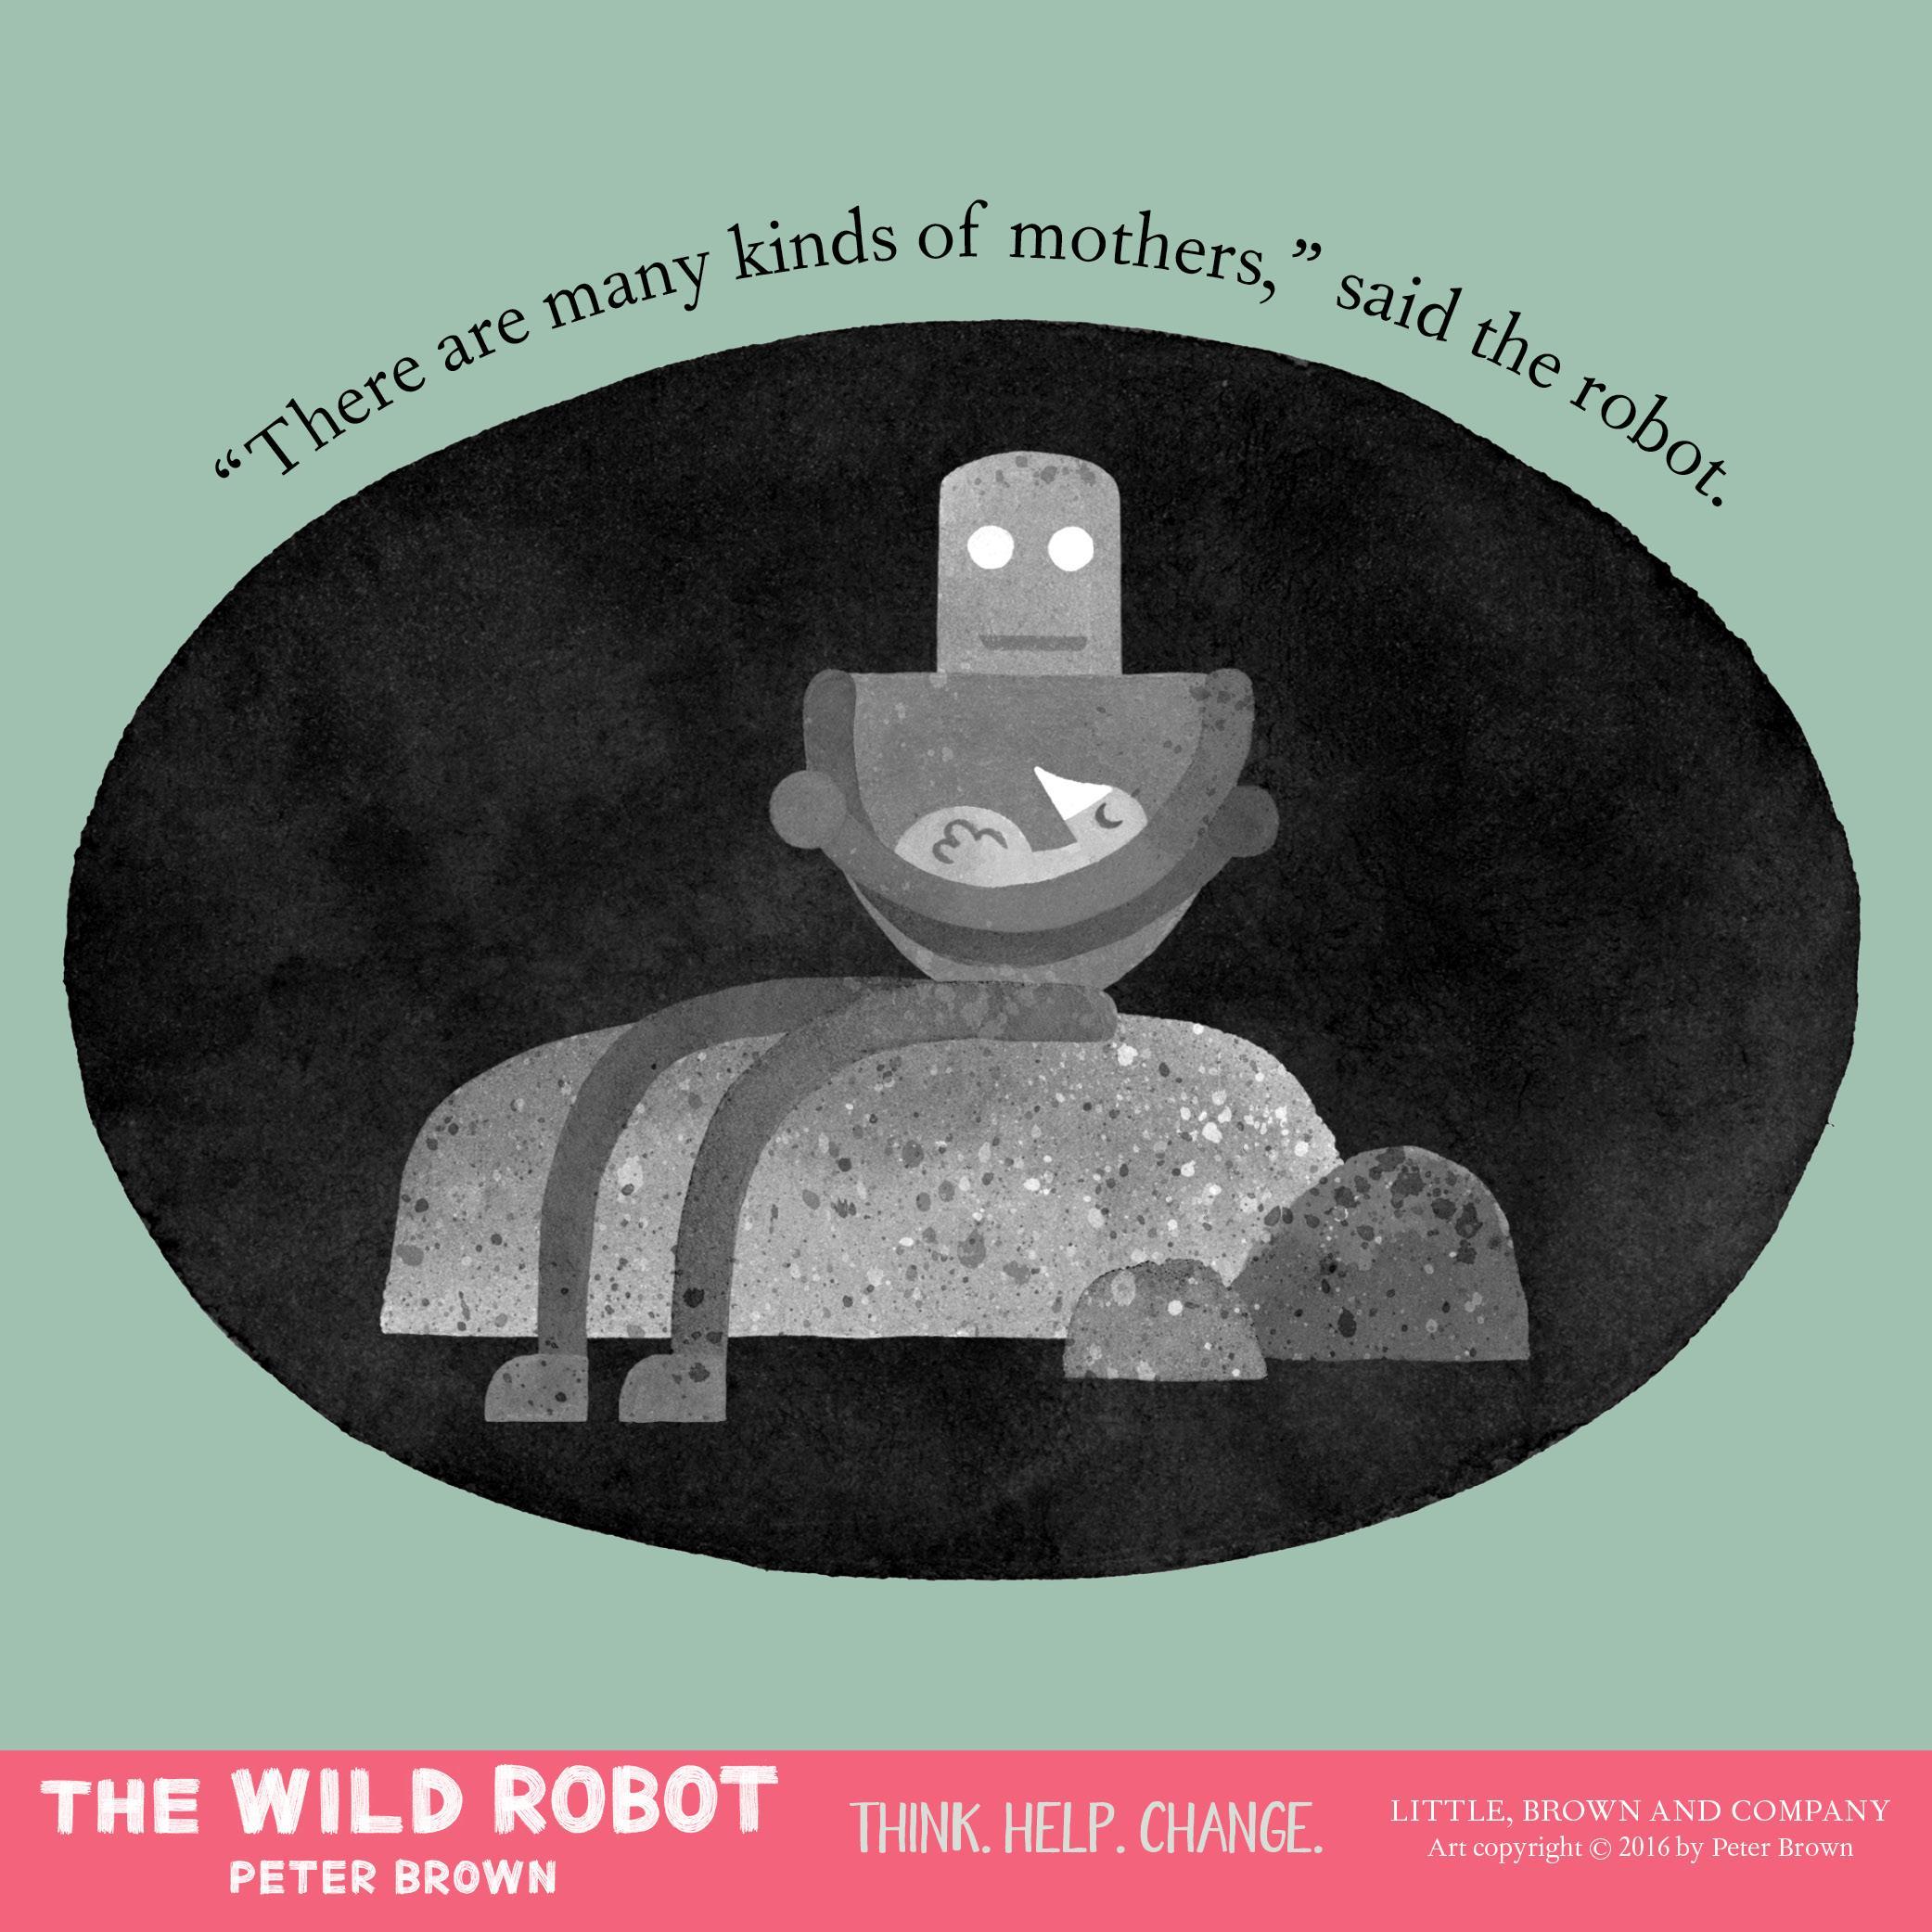 Amazon.com: The Wild Robot (9780316381994): Peter Brown: Books